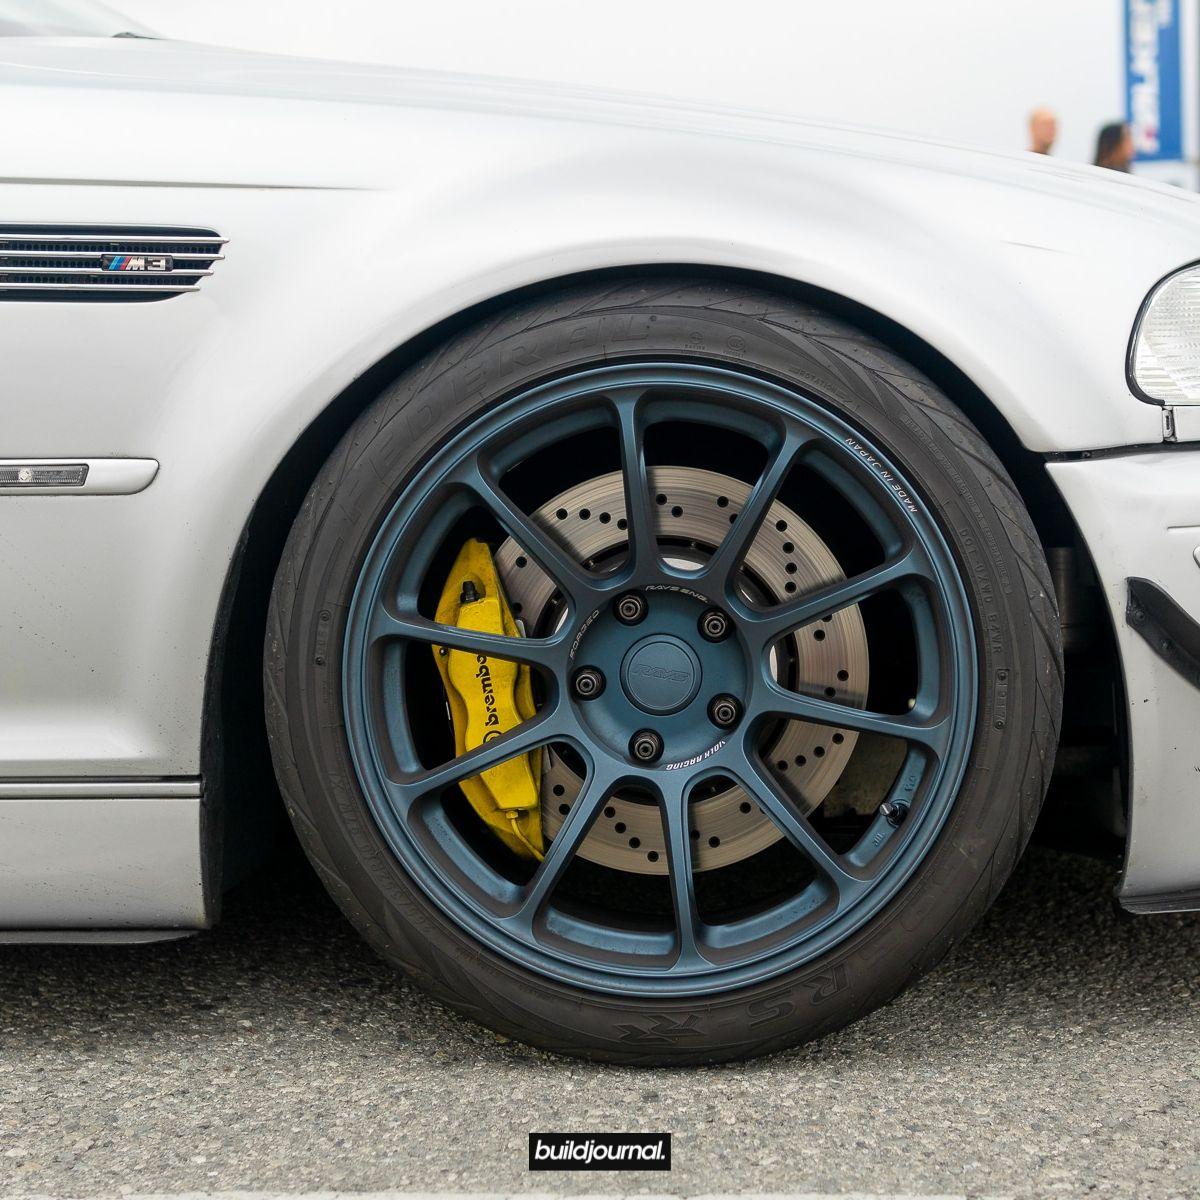 Aston Martin DB9 BBK Retrofit for E46 M3 Review